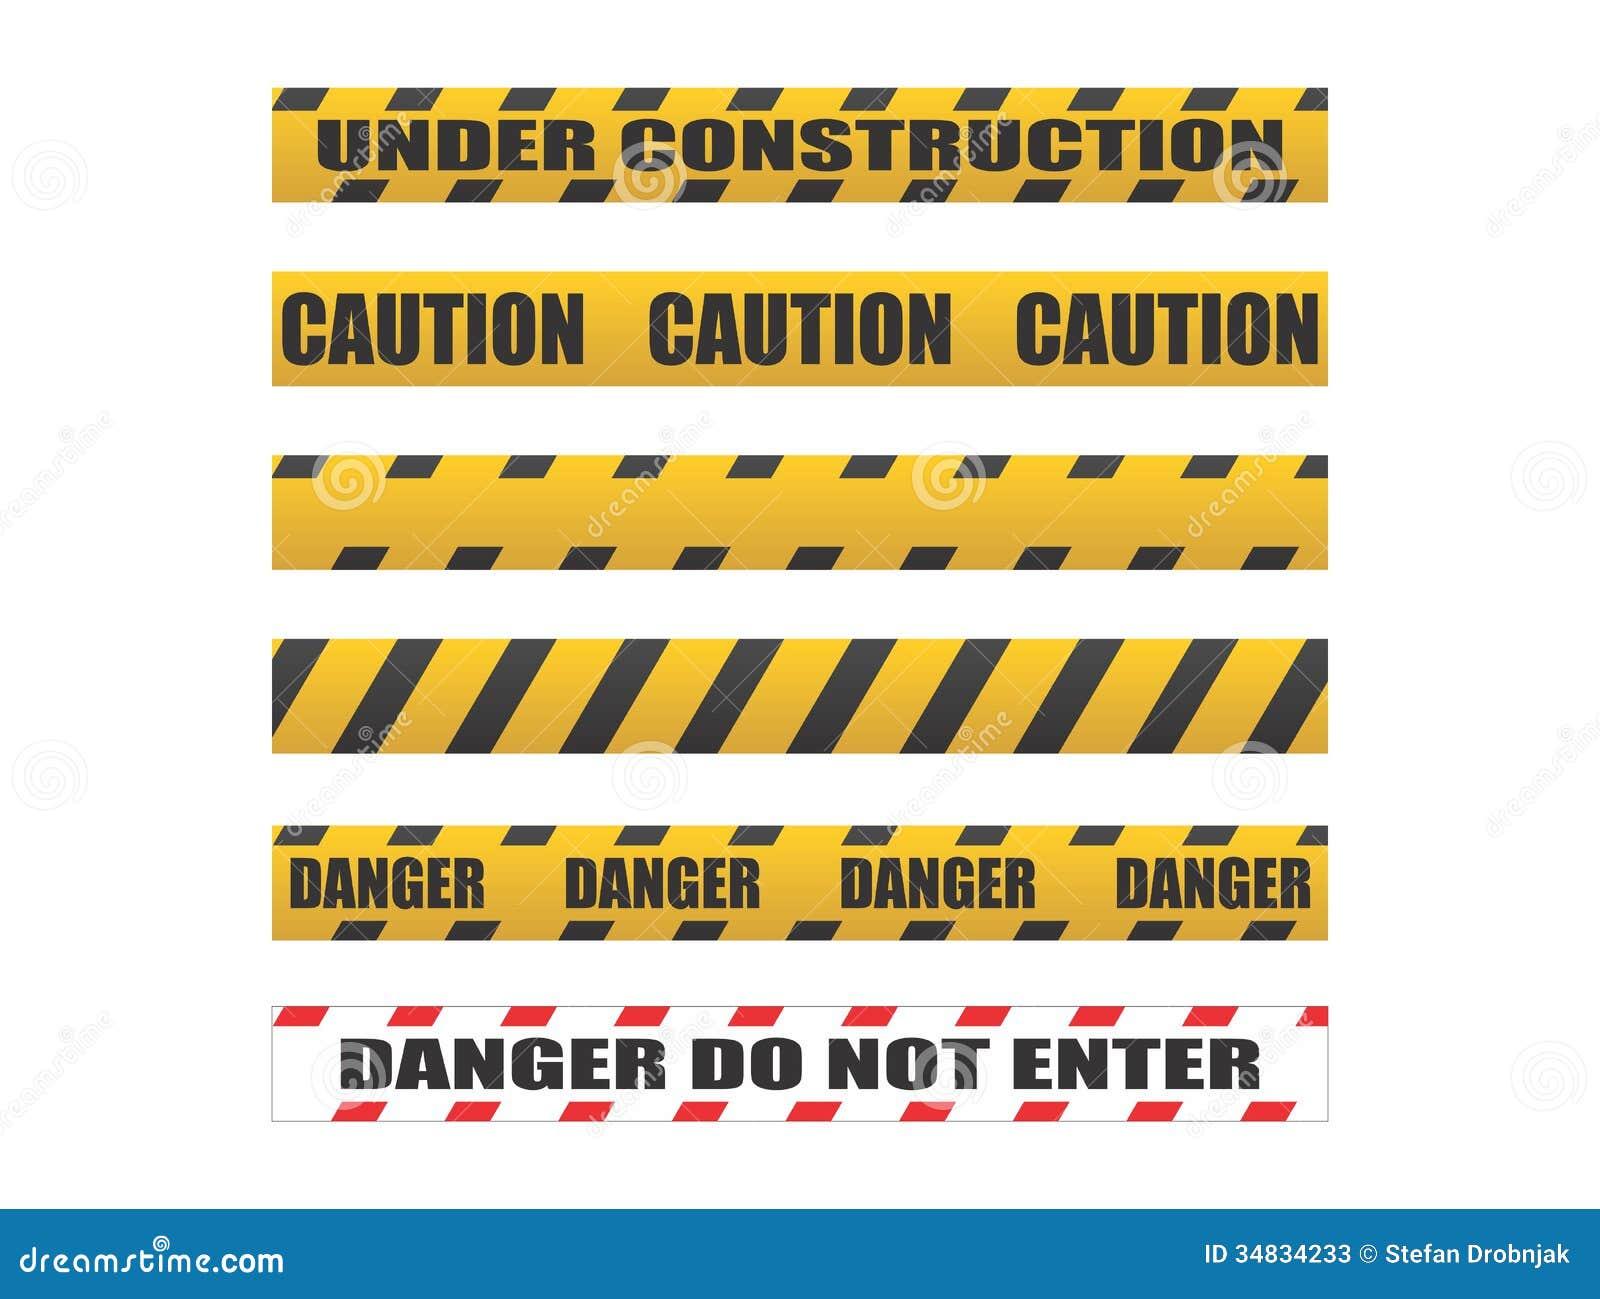 Under Construction Tape Background Caution Tapes, Danger ...